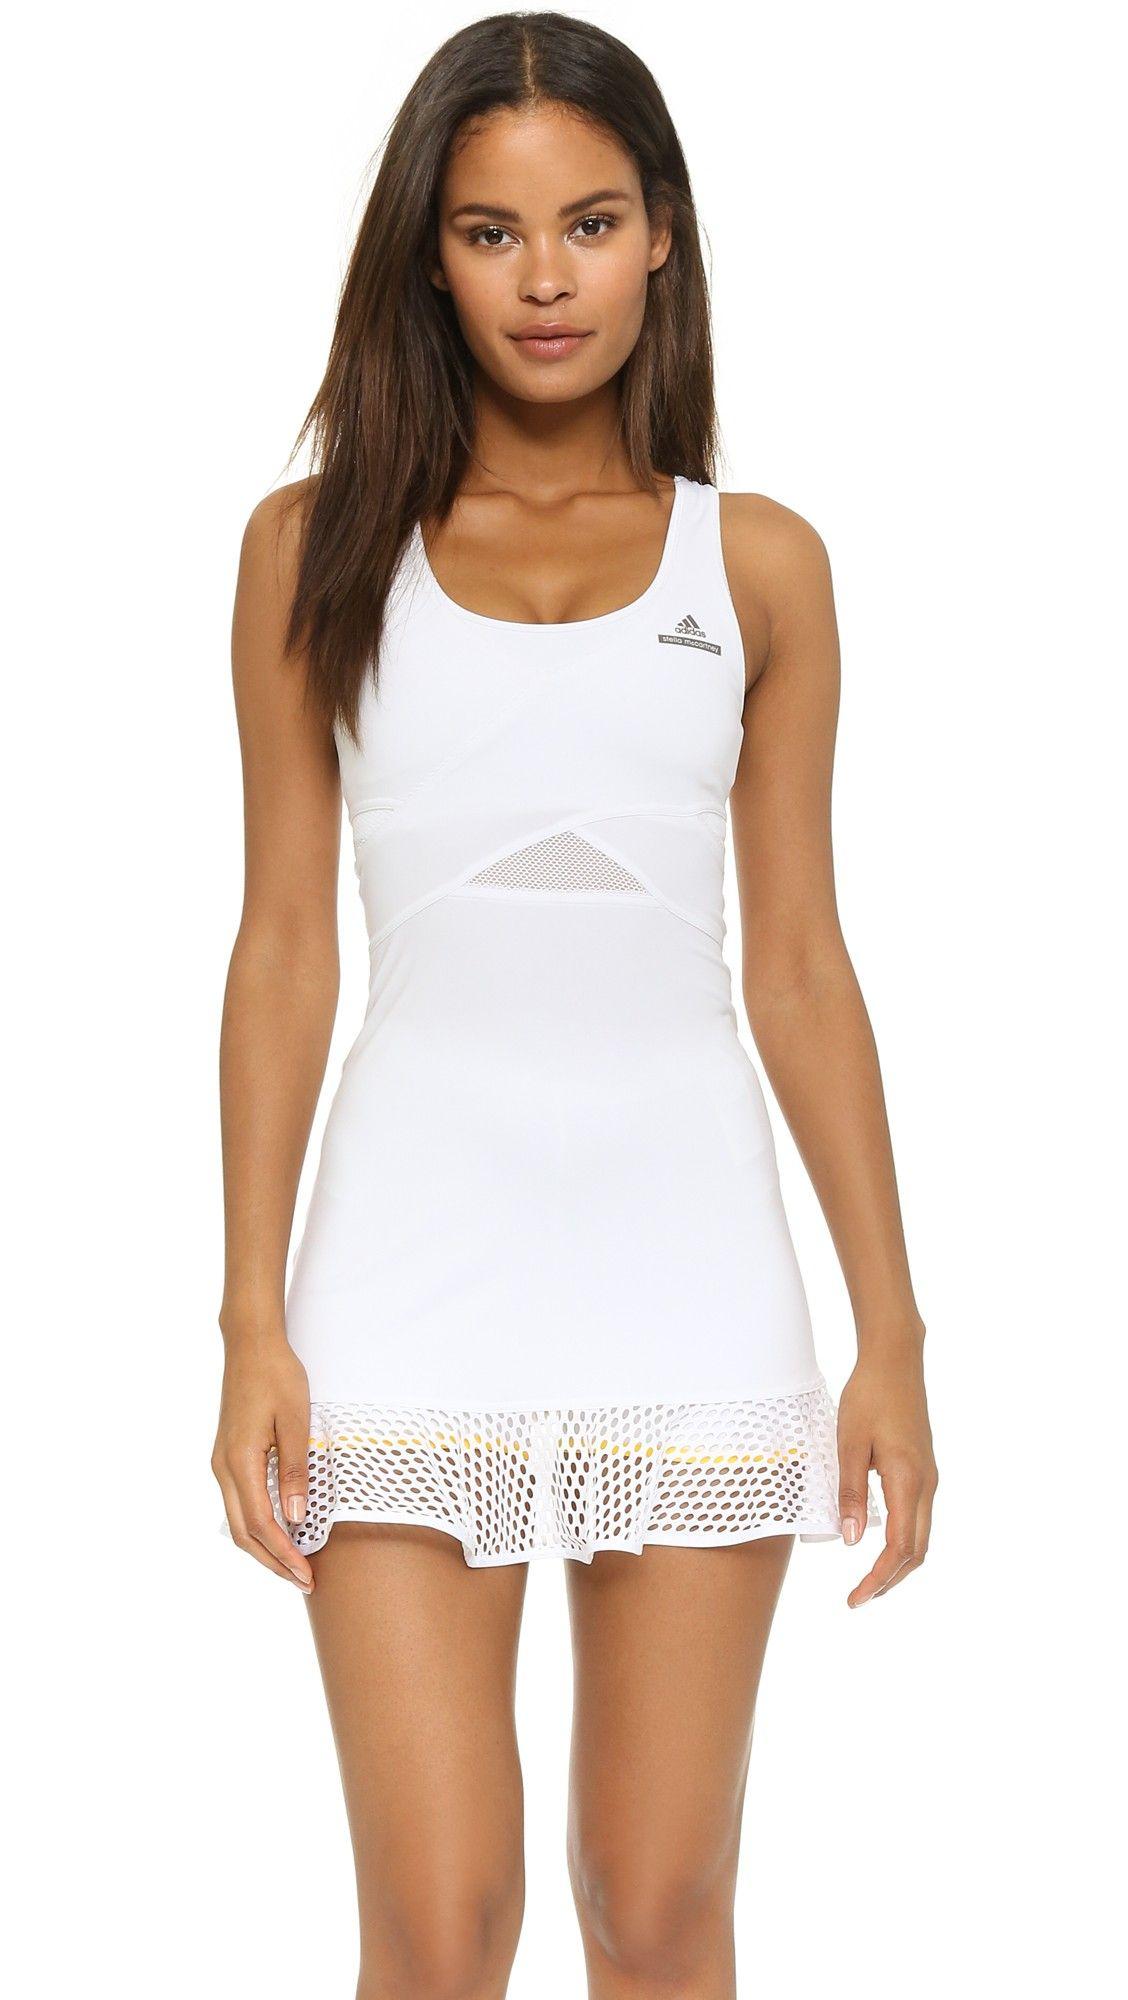 Adidas By Stella Mccartney Stella Tennis Dress Shopbop Tennis Outfit Women Tennis Dress Tennis Clothes [ 2000 x 1128 Pixel ]